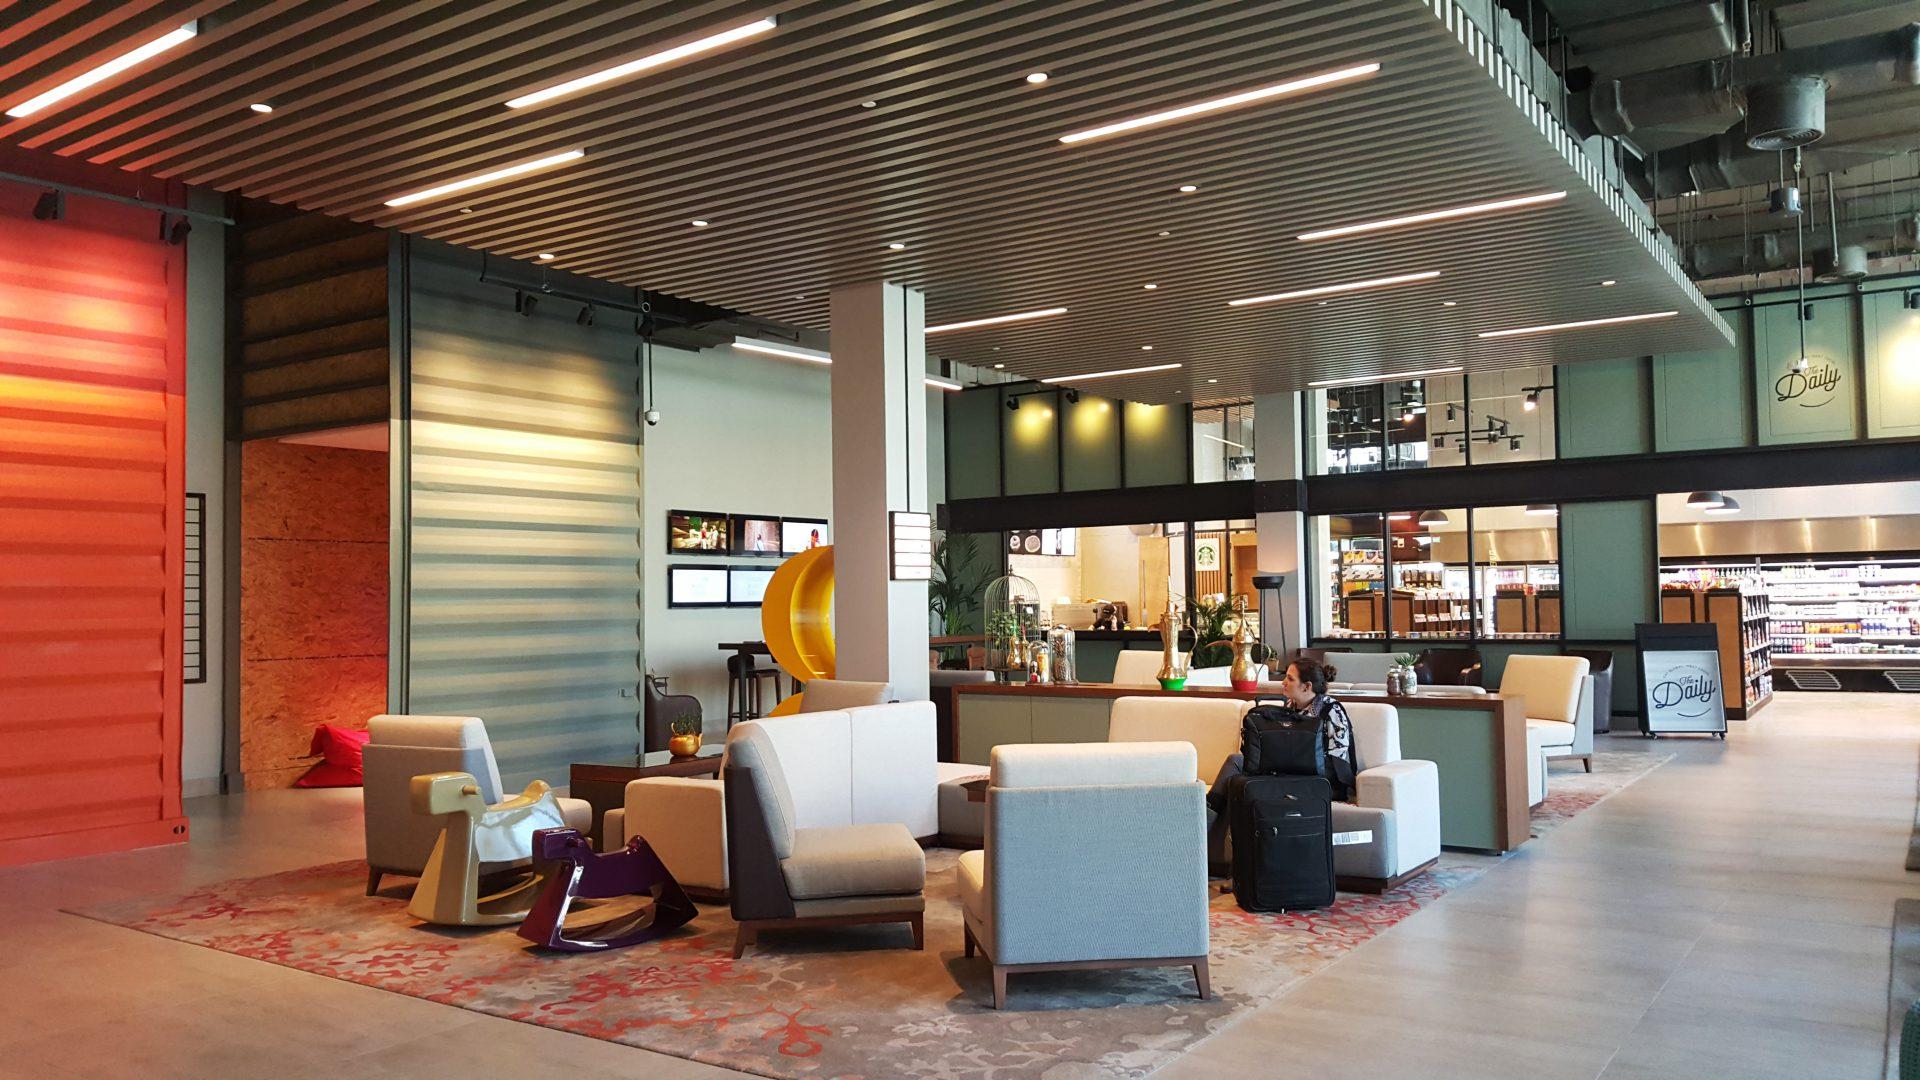 Rove Hotel Shortlisted For Mena Design Award Stride Treglown